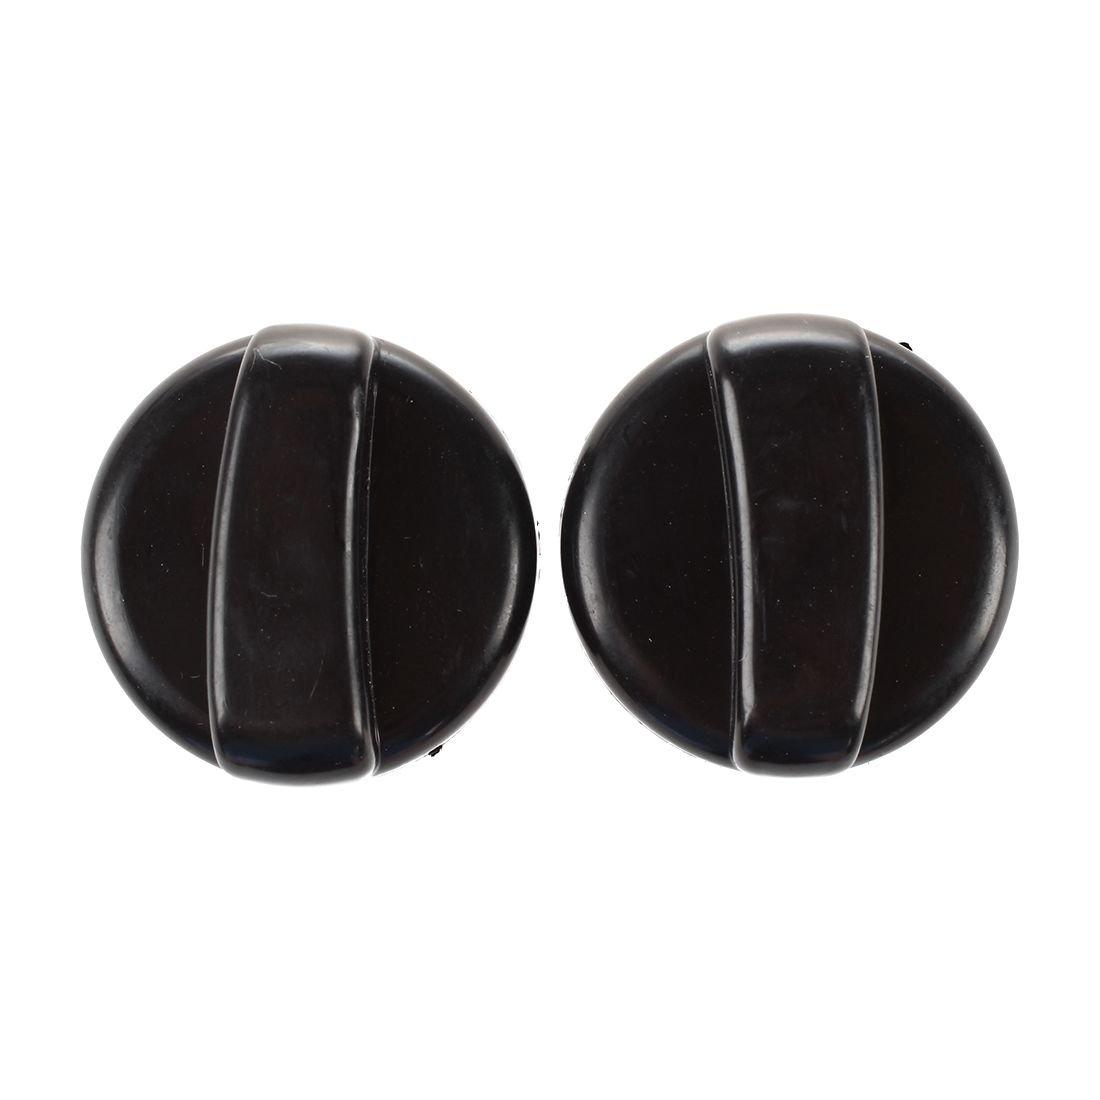 SODIAL Plastic Gas Stove Cooker Control Knobs 2 PCS Black